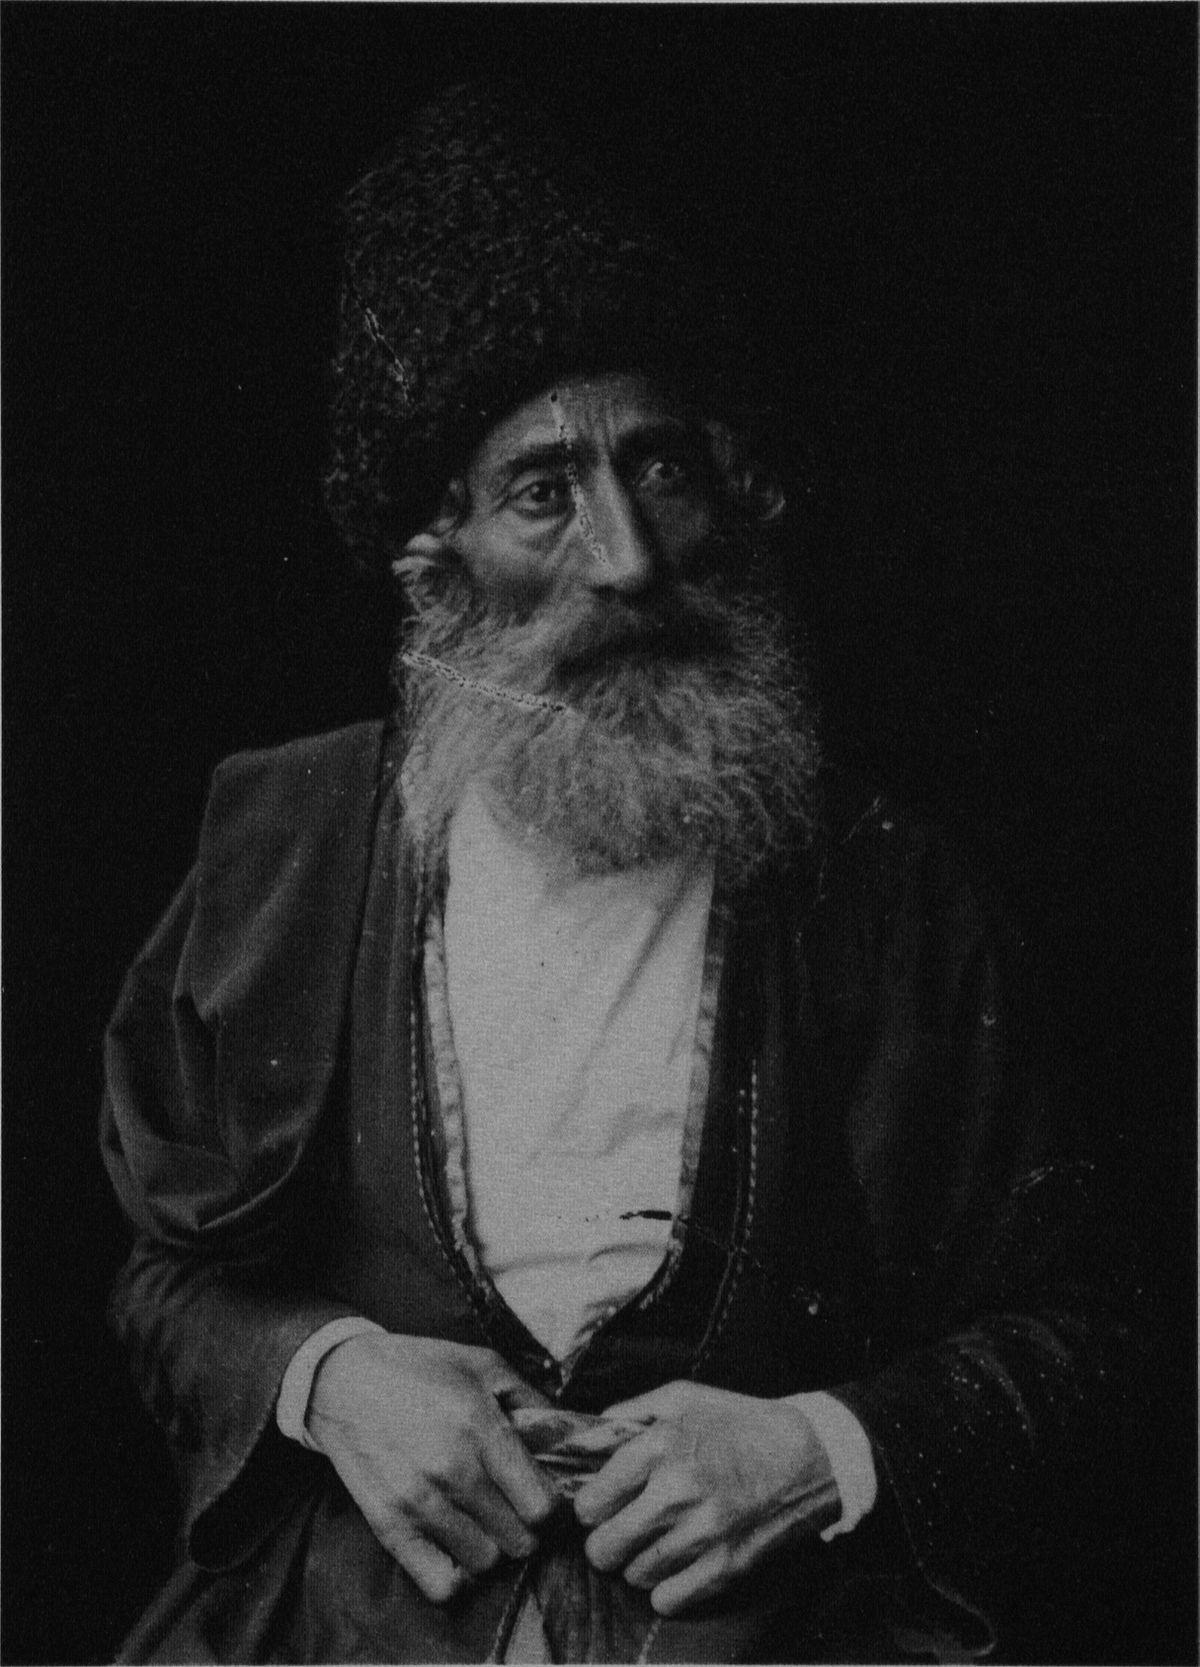 history of the jews in georgia